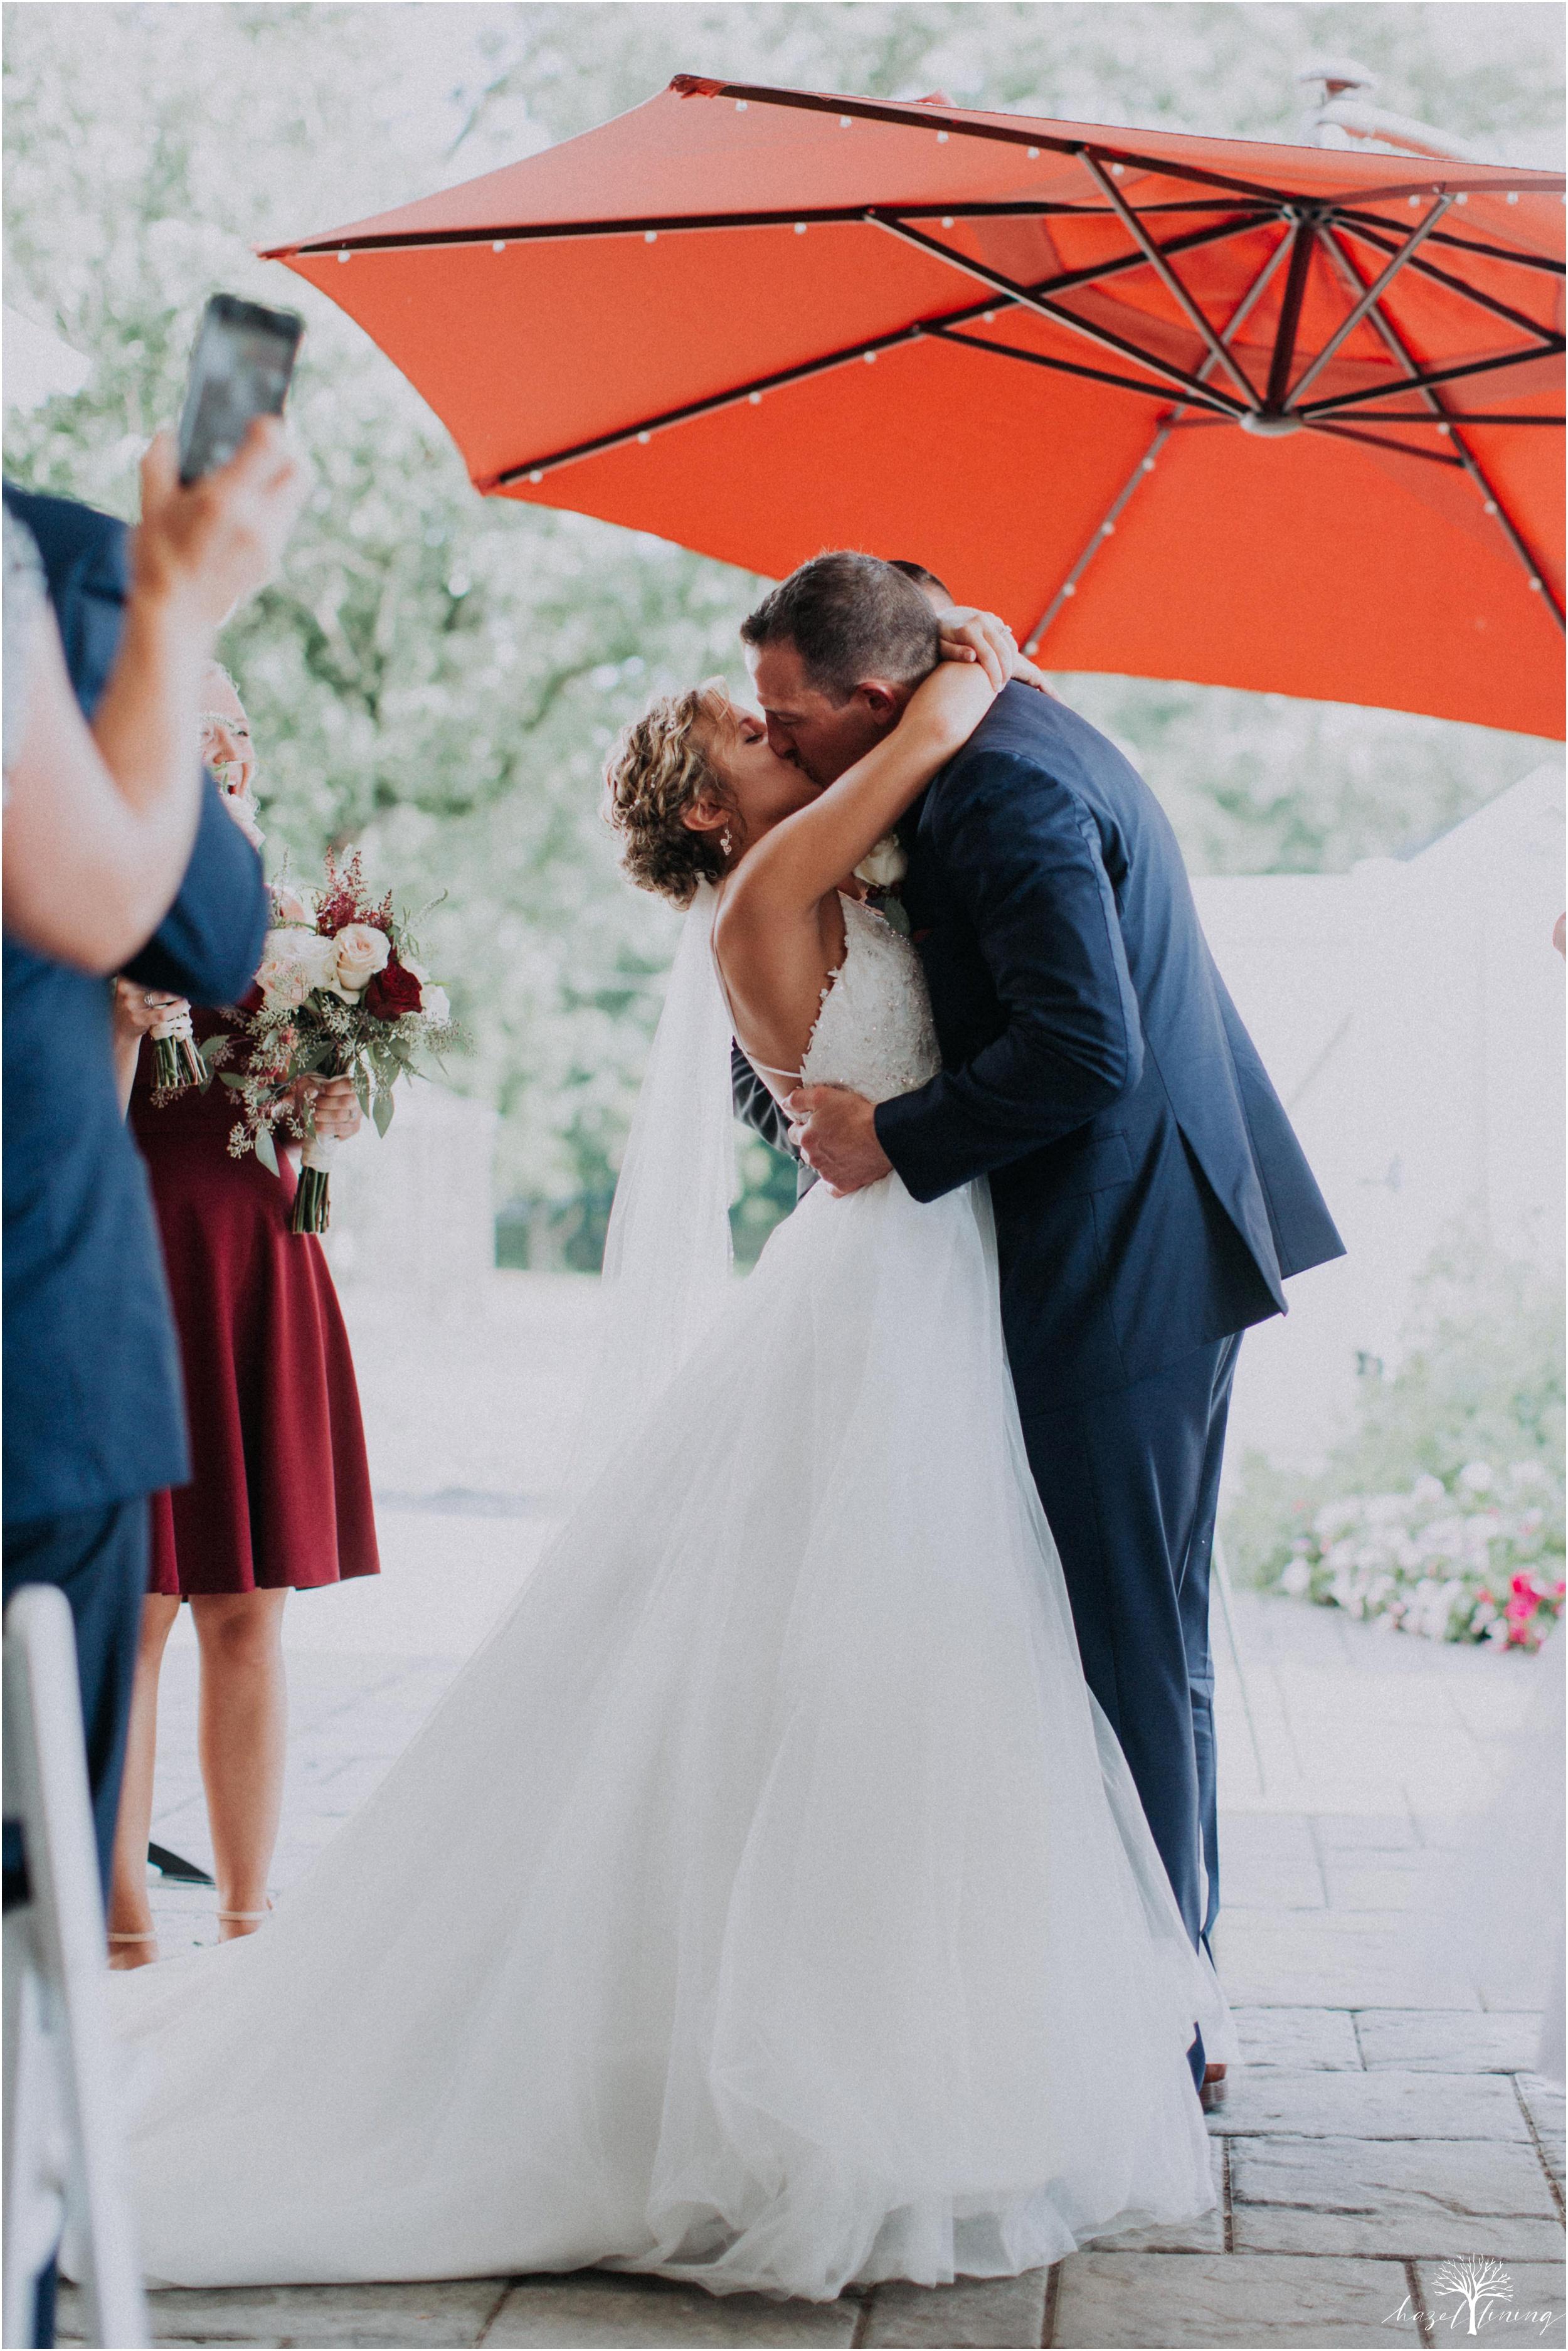 jonathan-weibel-becky-haywood-loft-at-sweetwater-cc-pennsburg-pennsylvania-rainy-day-summer-wedding-hazel-lining-travel-wedding-elopement-photography_0058.jpg